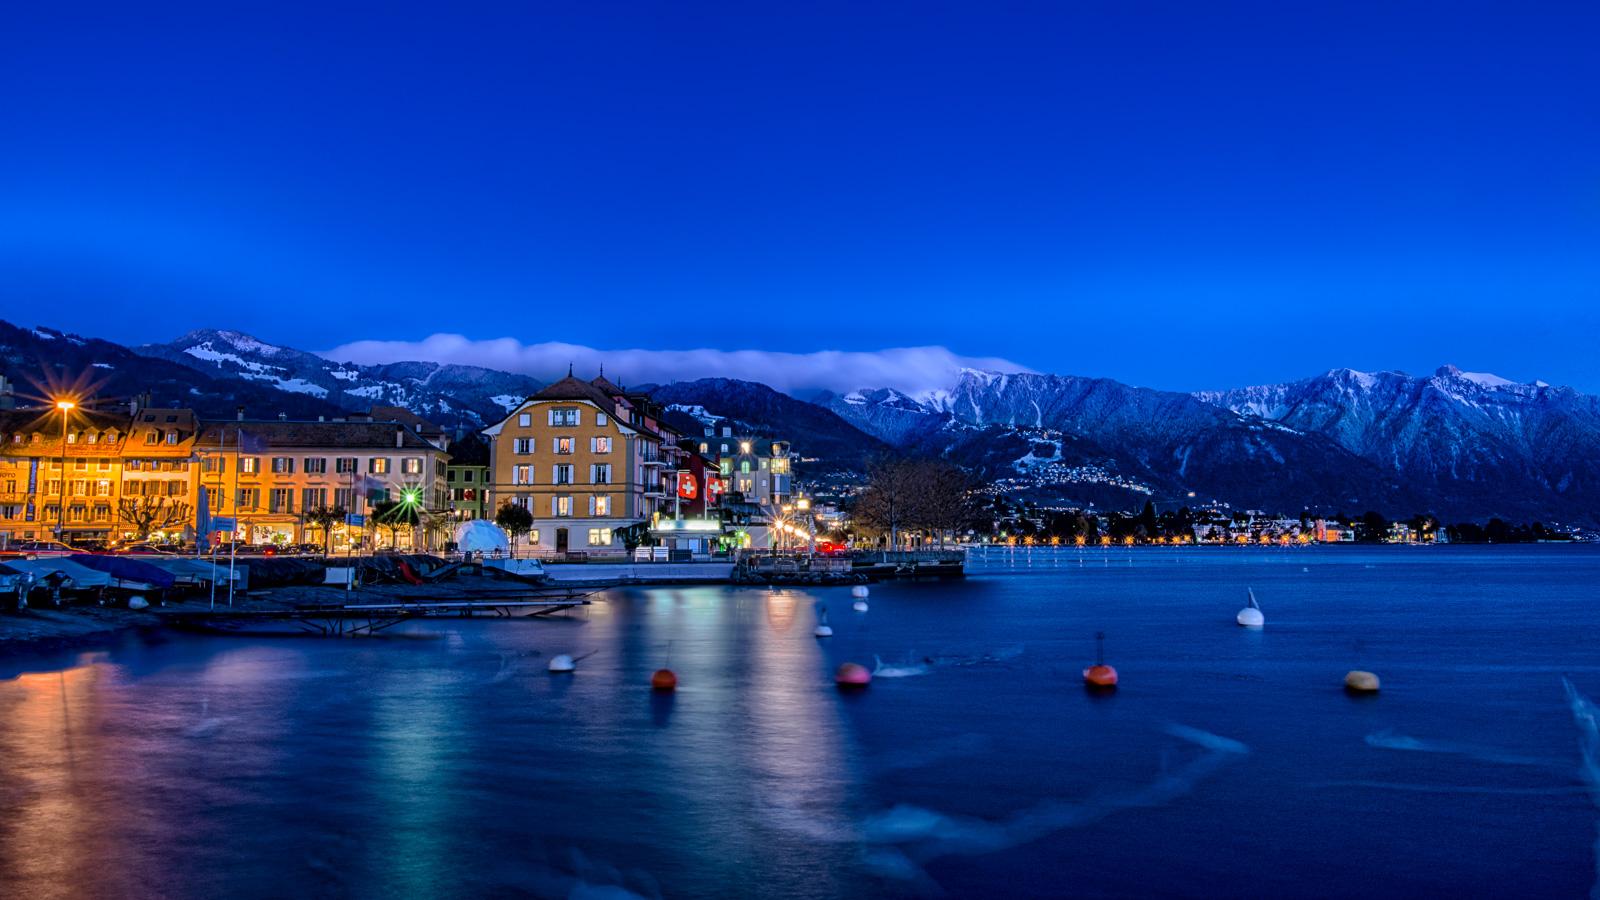 Vevey by night, Switzerland